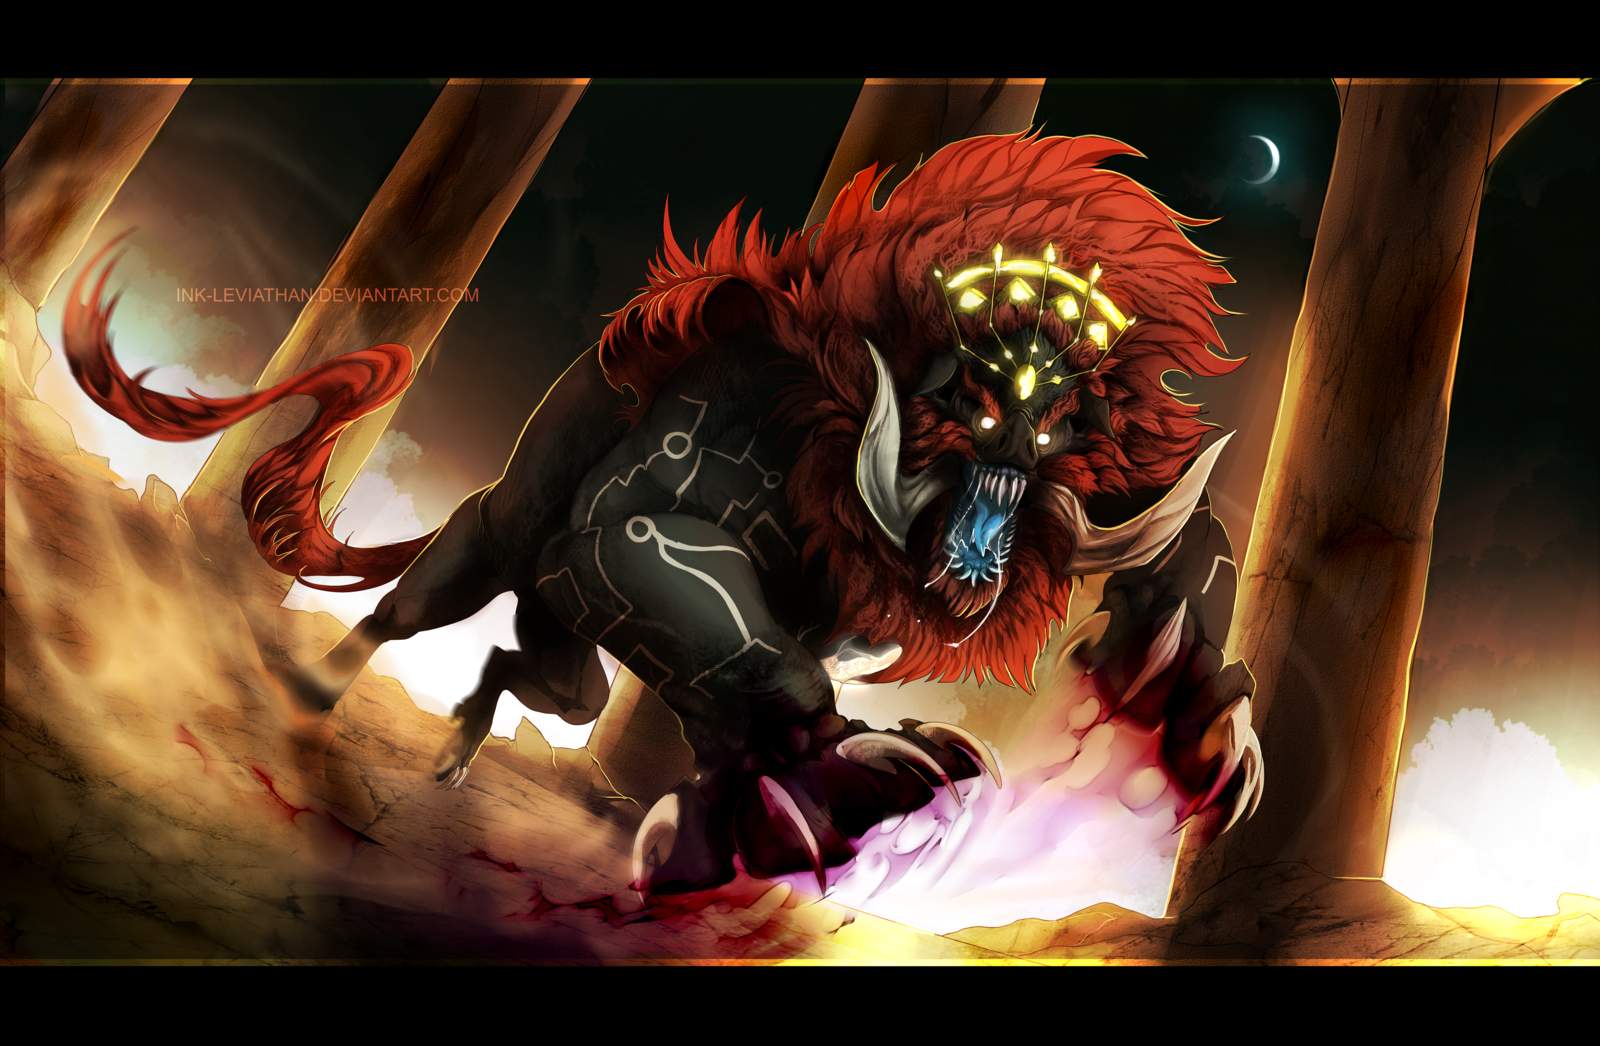 Legend Of Zelda Beast Ganon By Ink Leviathan Deviantart Com